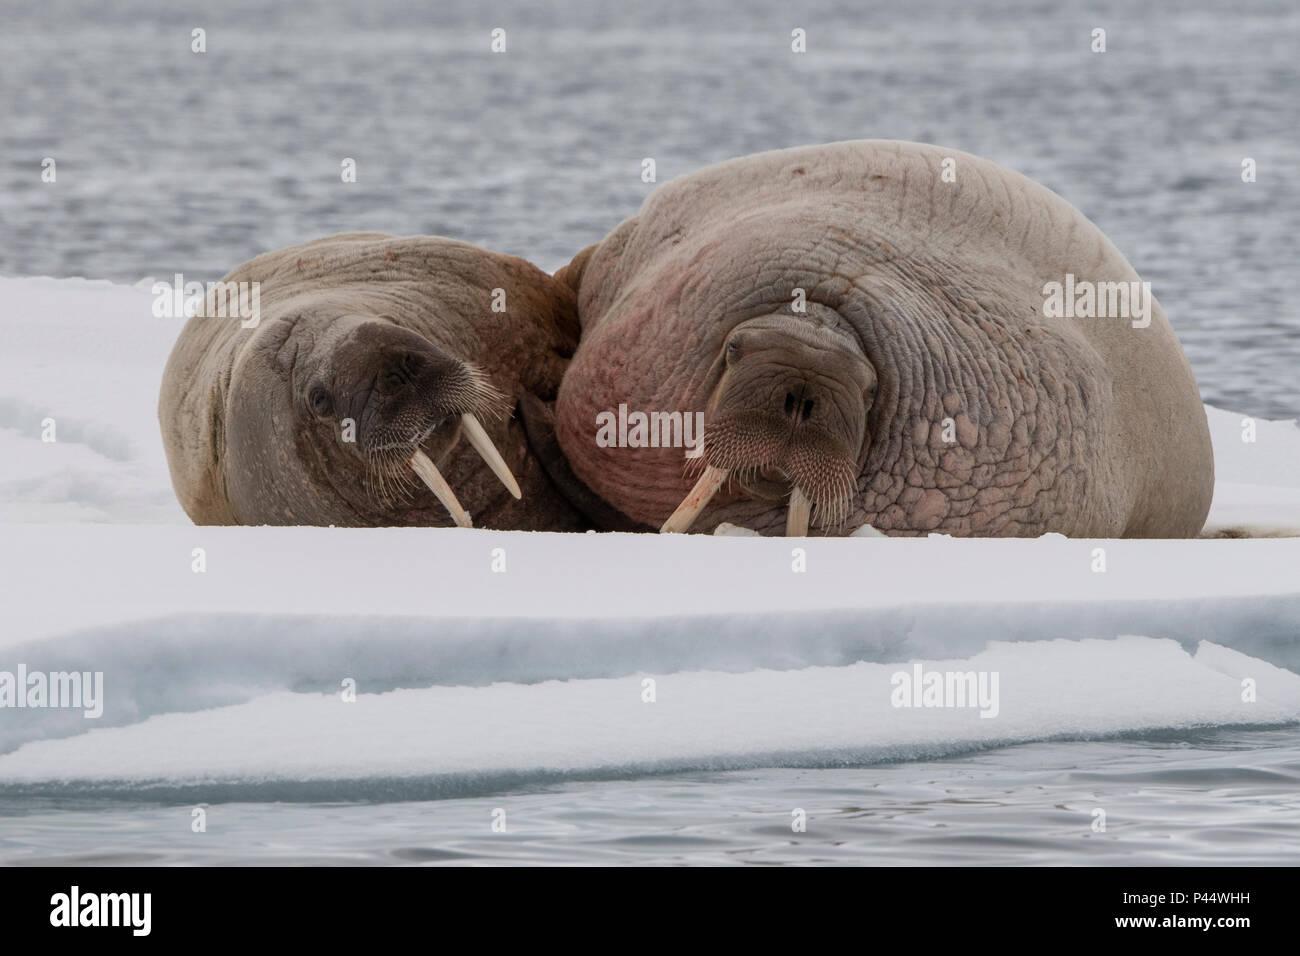 La Norvège, Svalbard, Nordaustlandet, Austfonna. Le morse (Odobenus rosmarus) sur la glace. Photo Stock